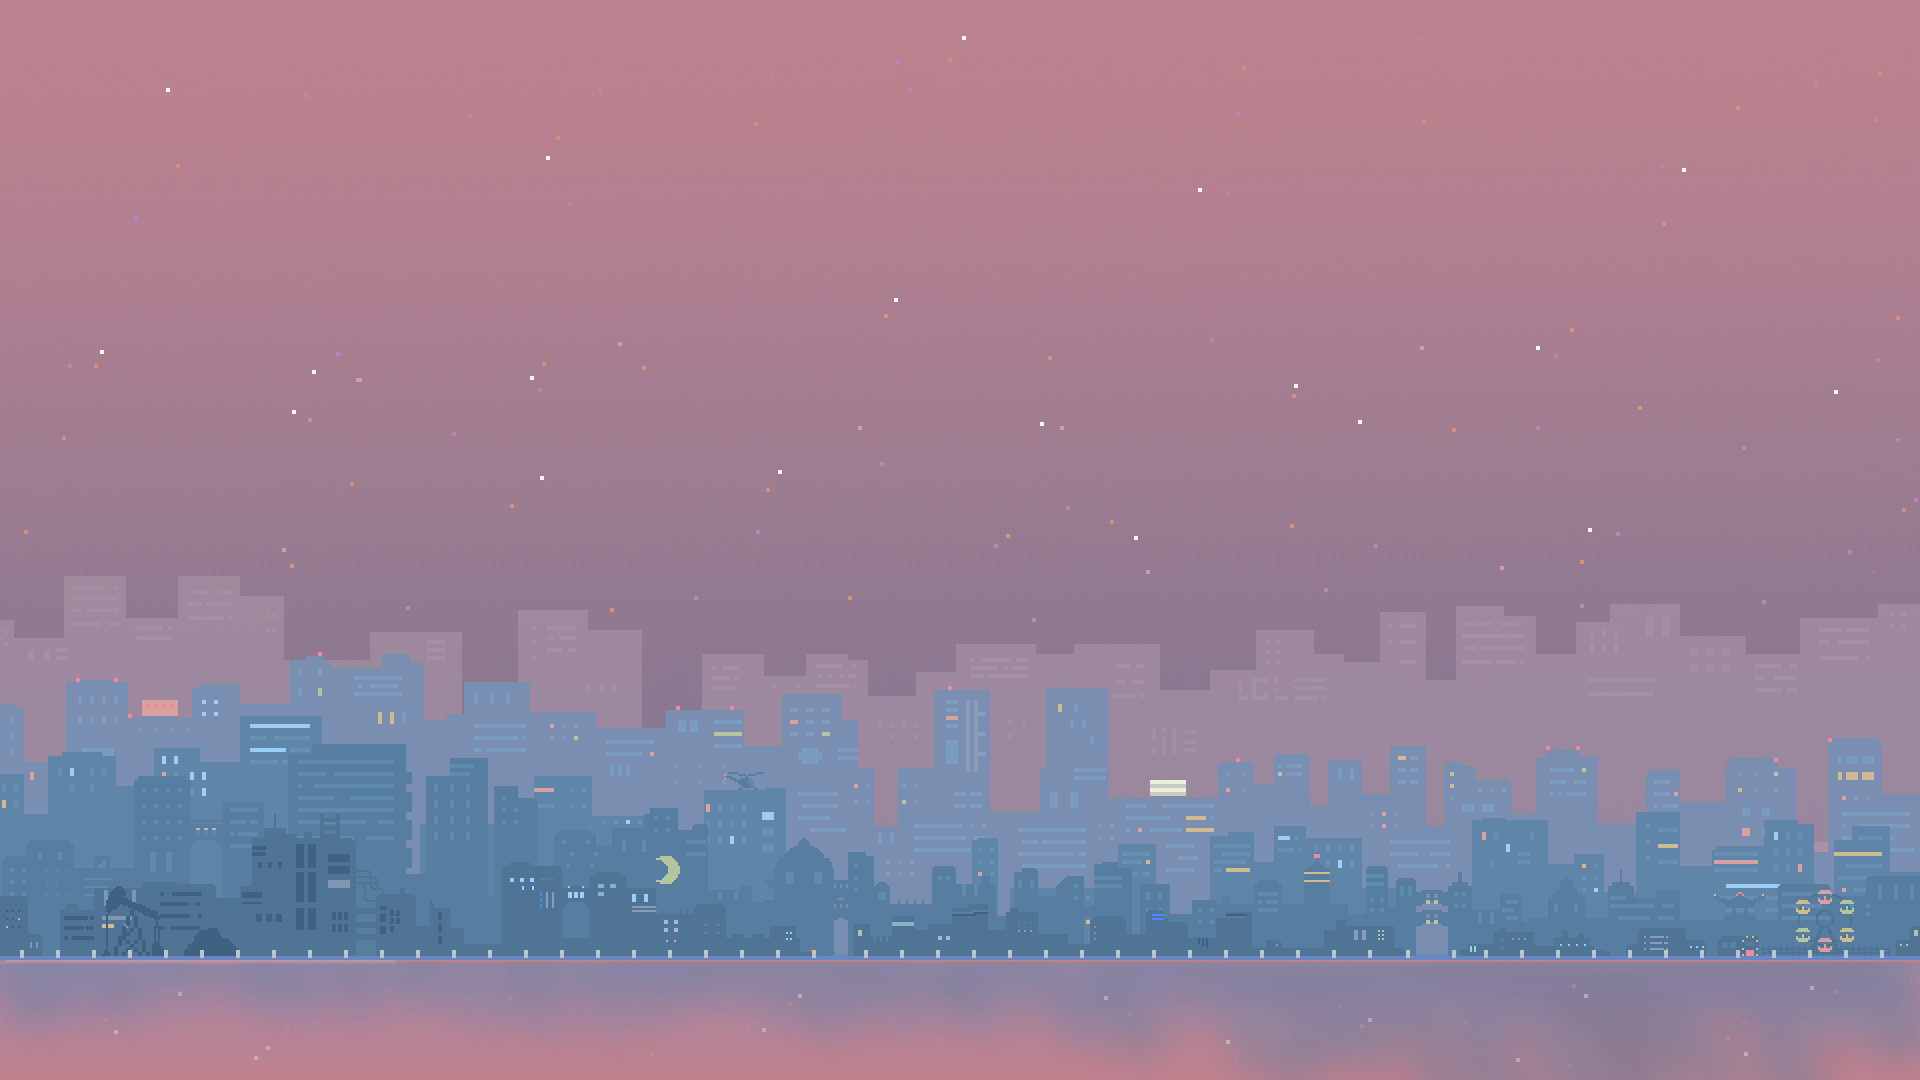 Animated Pixel Art (Got any? Send'em!)